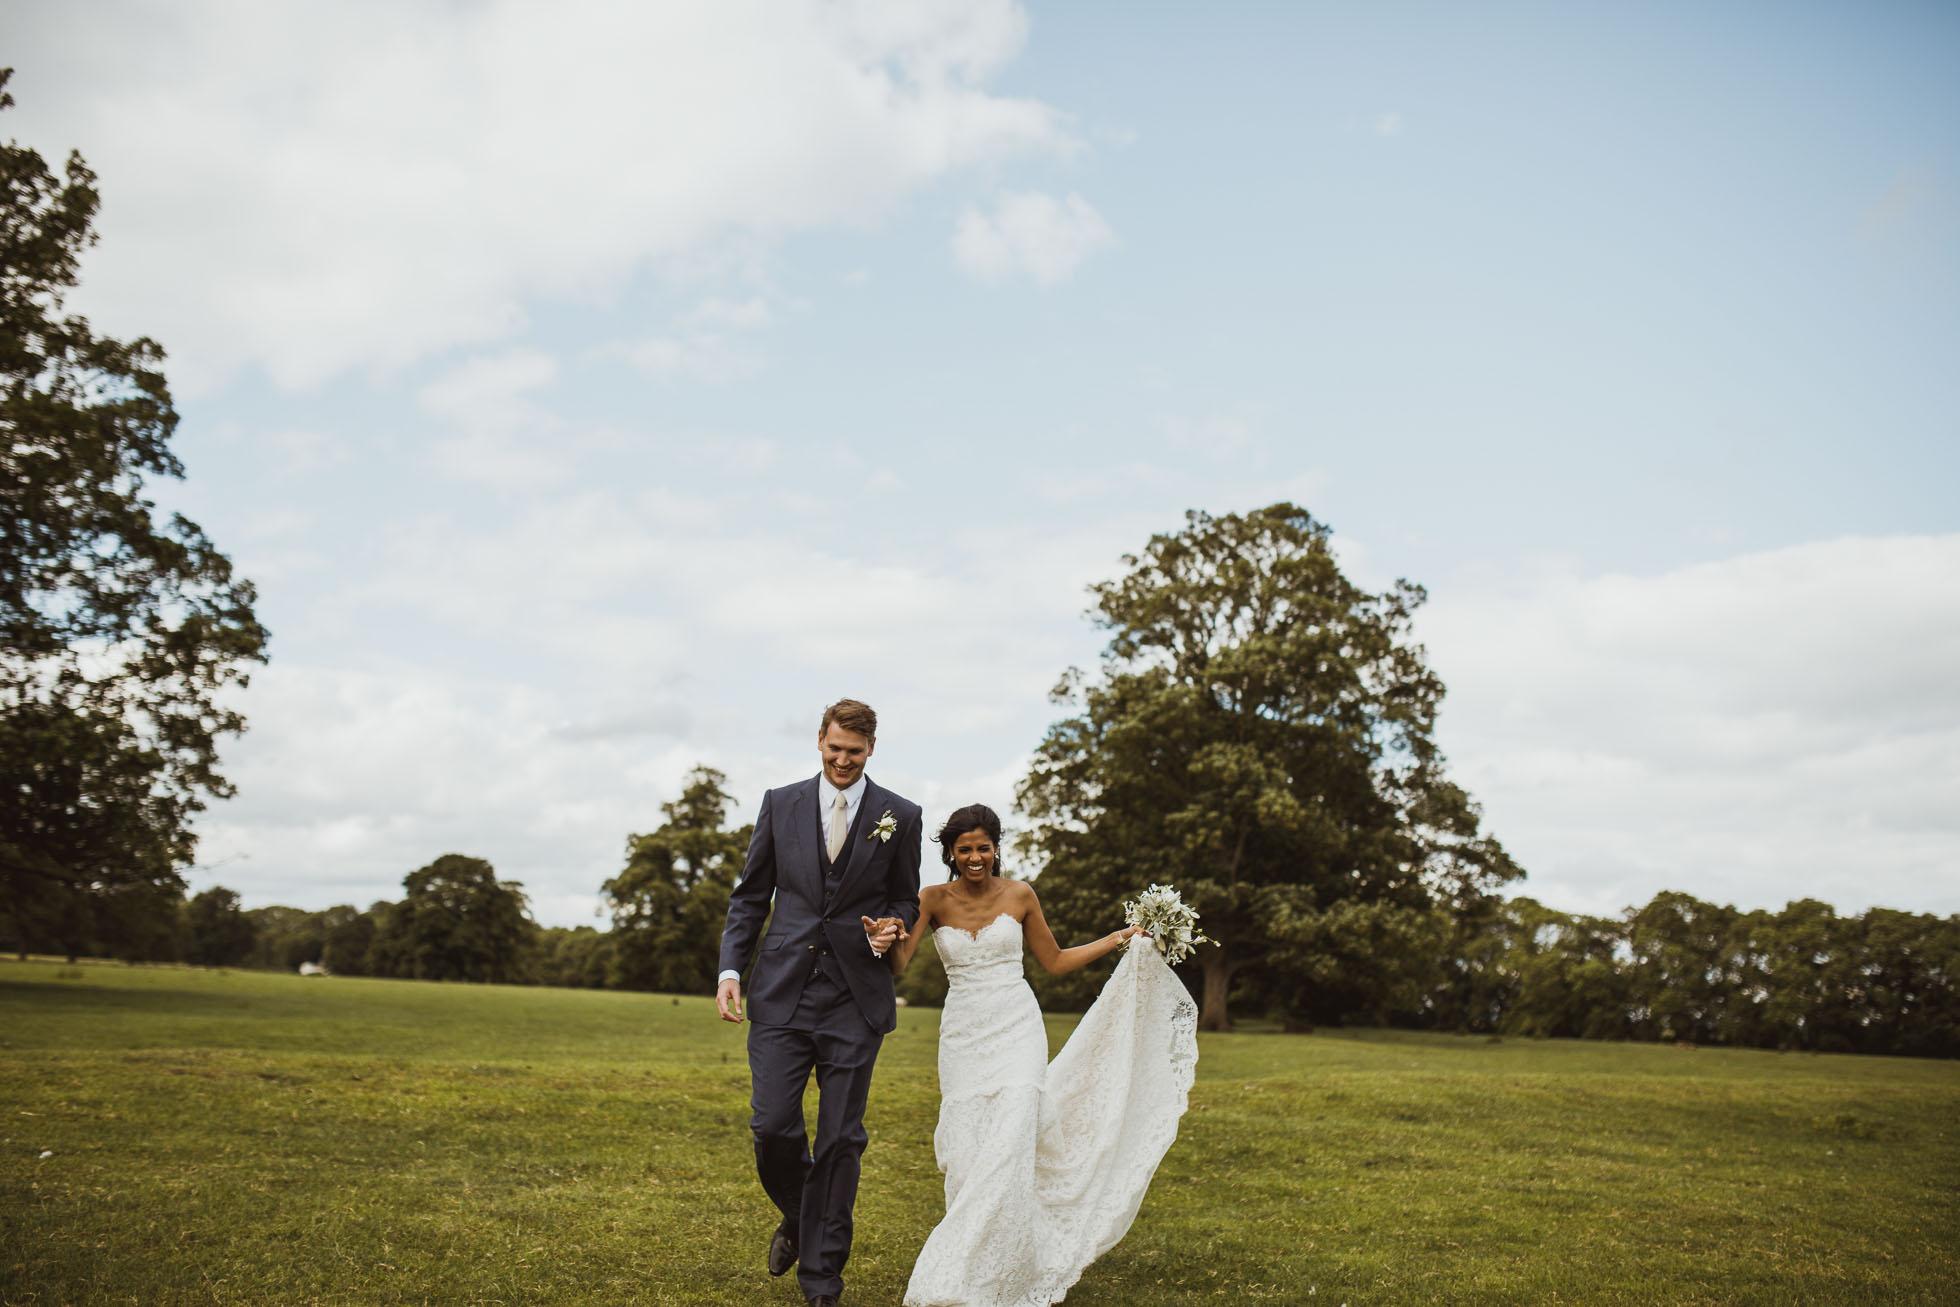 norton_conyers_wedding_photographer-52.jpg